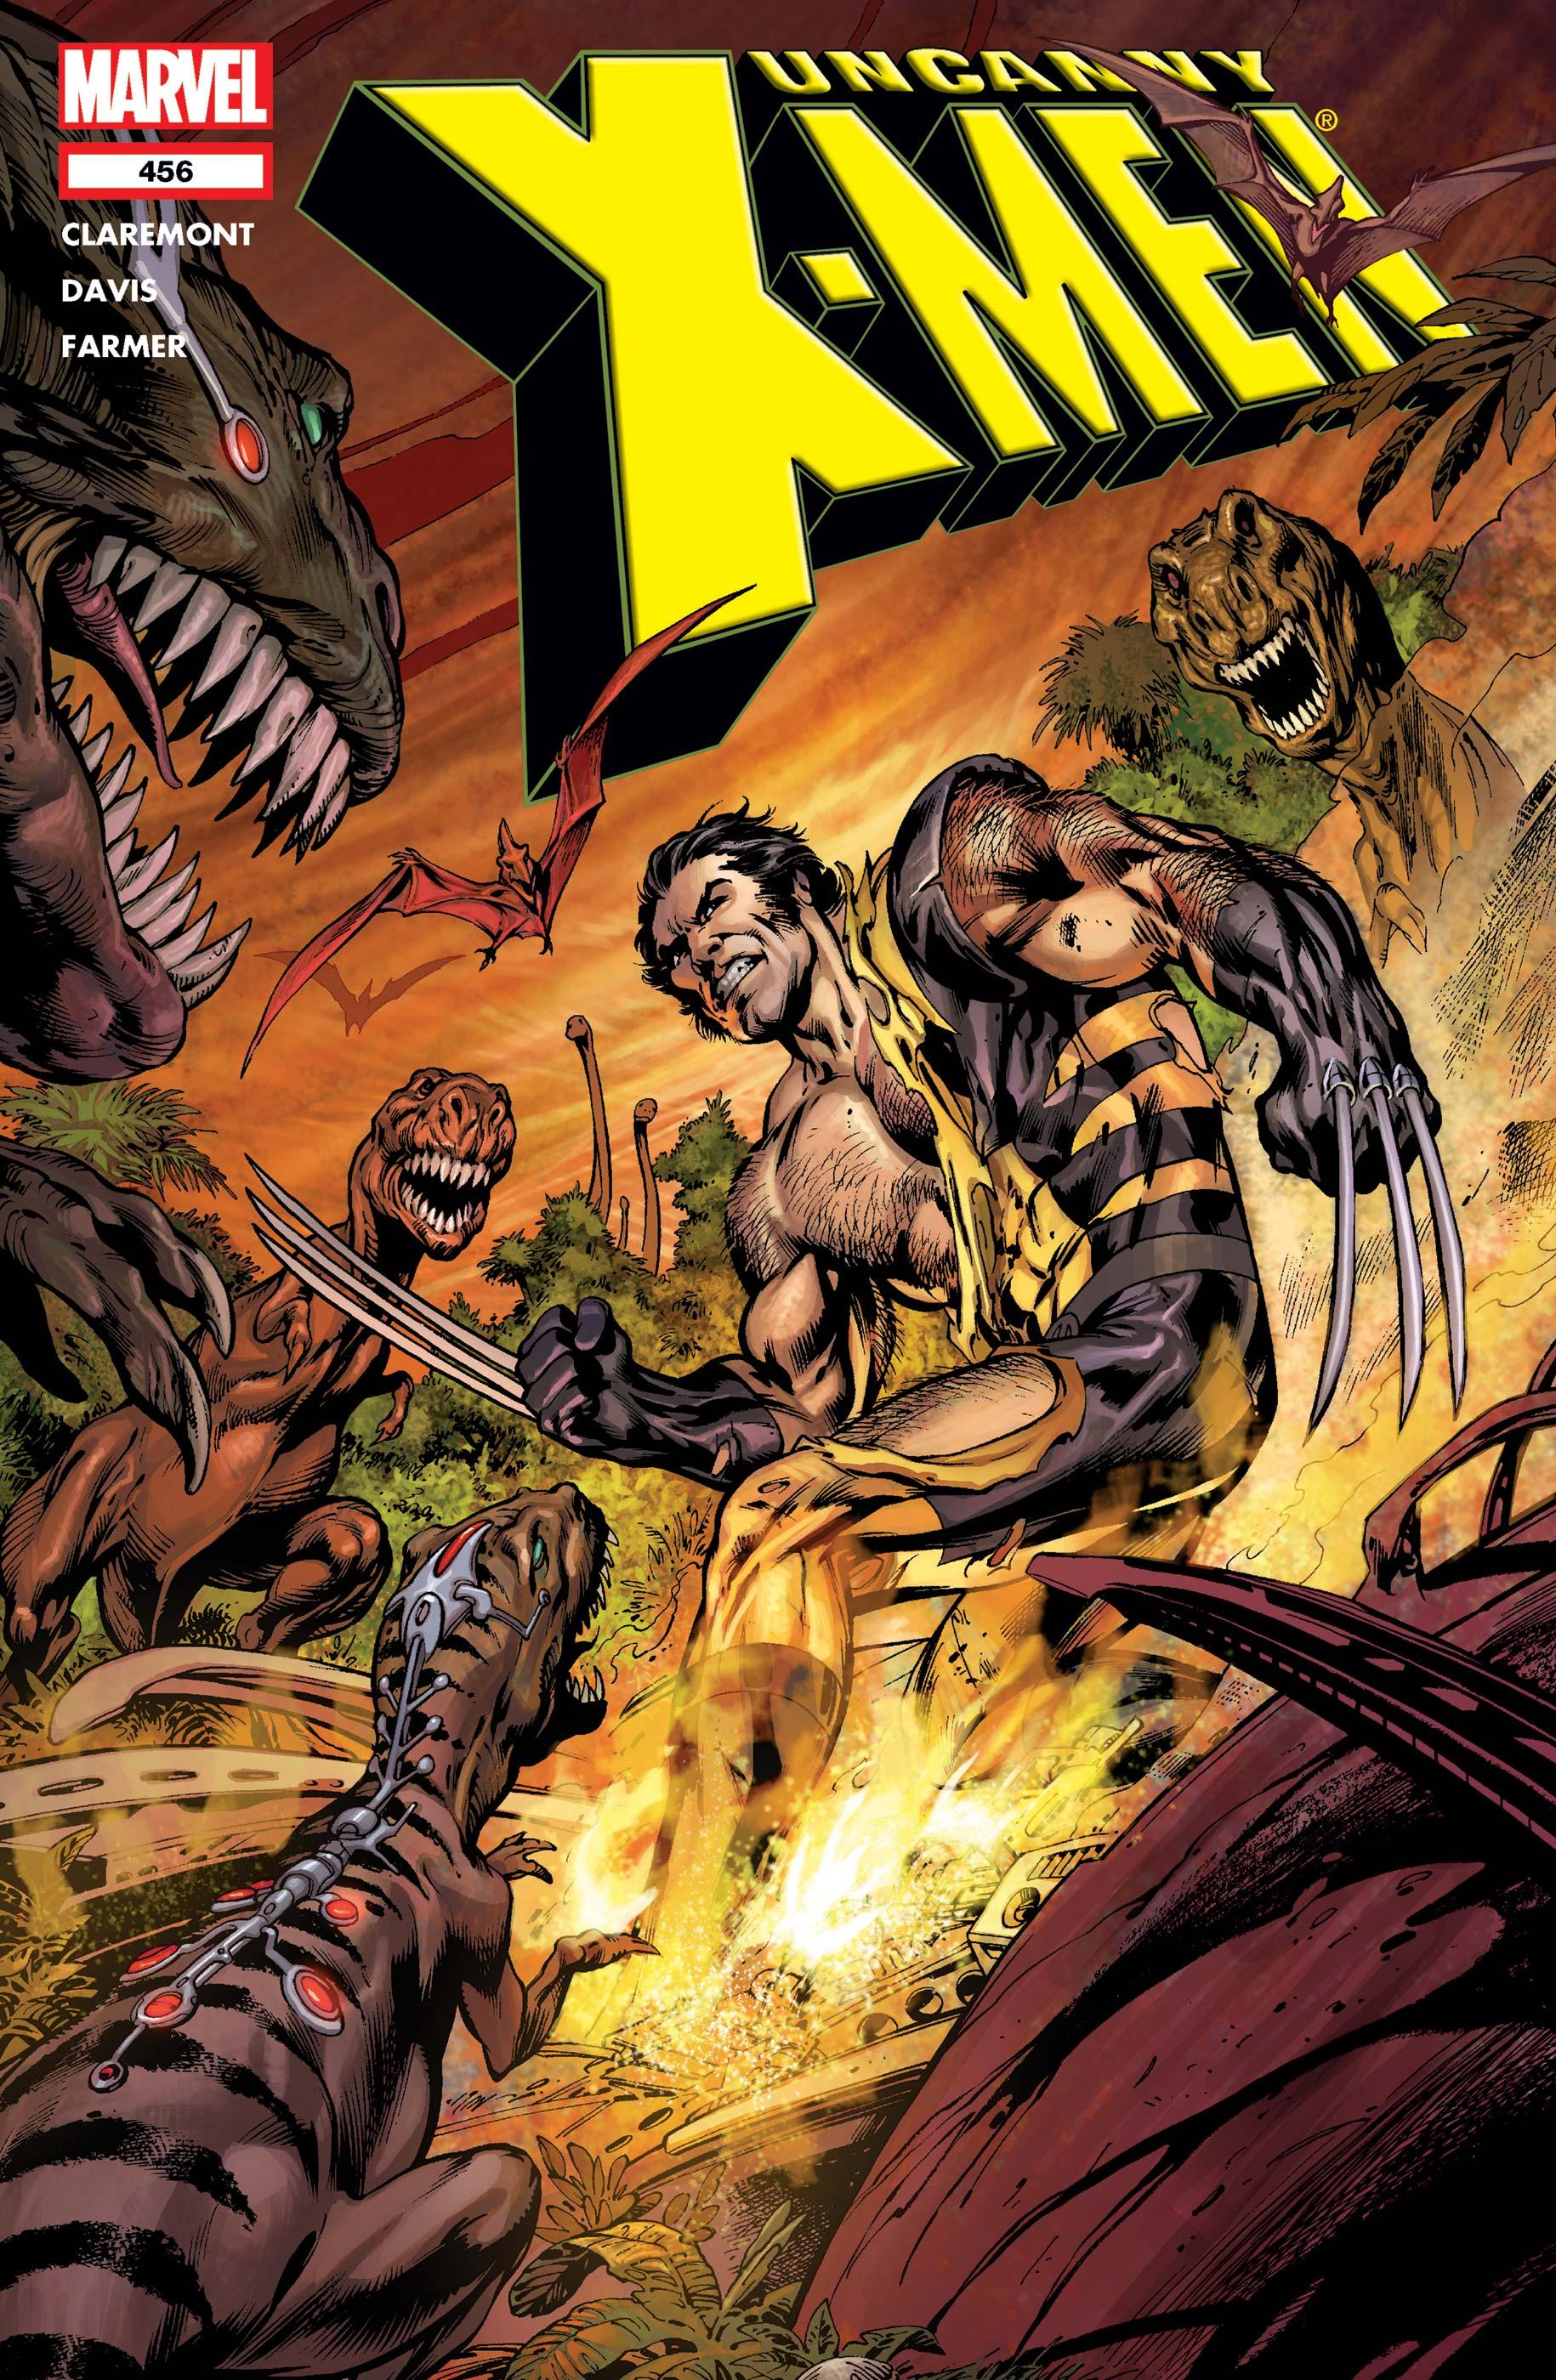 Uncanny X-Men (1963) #456